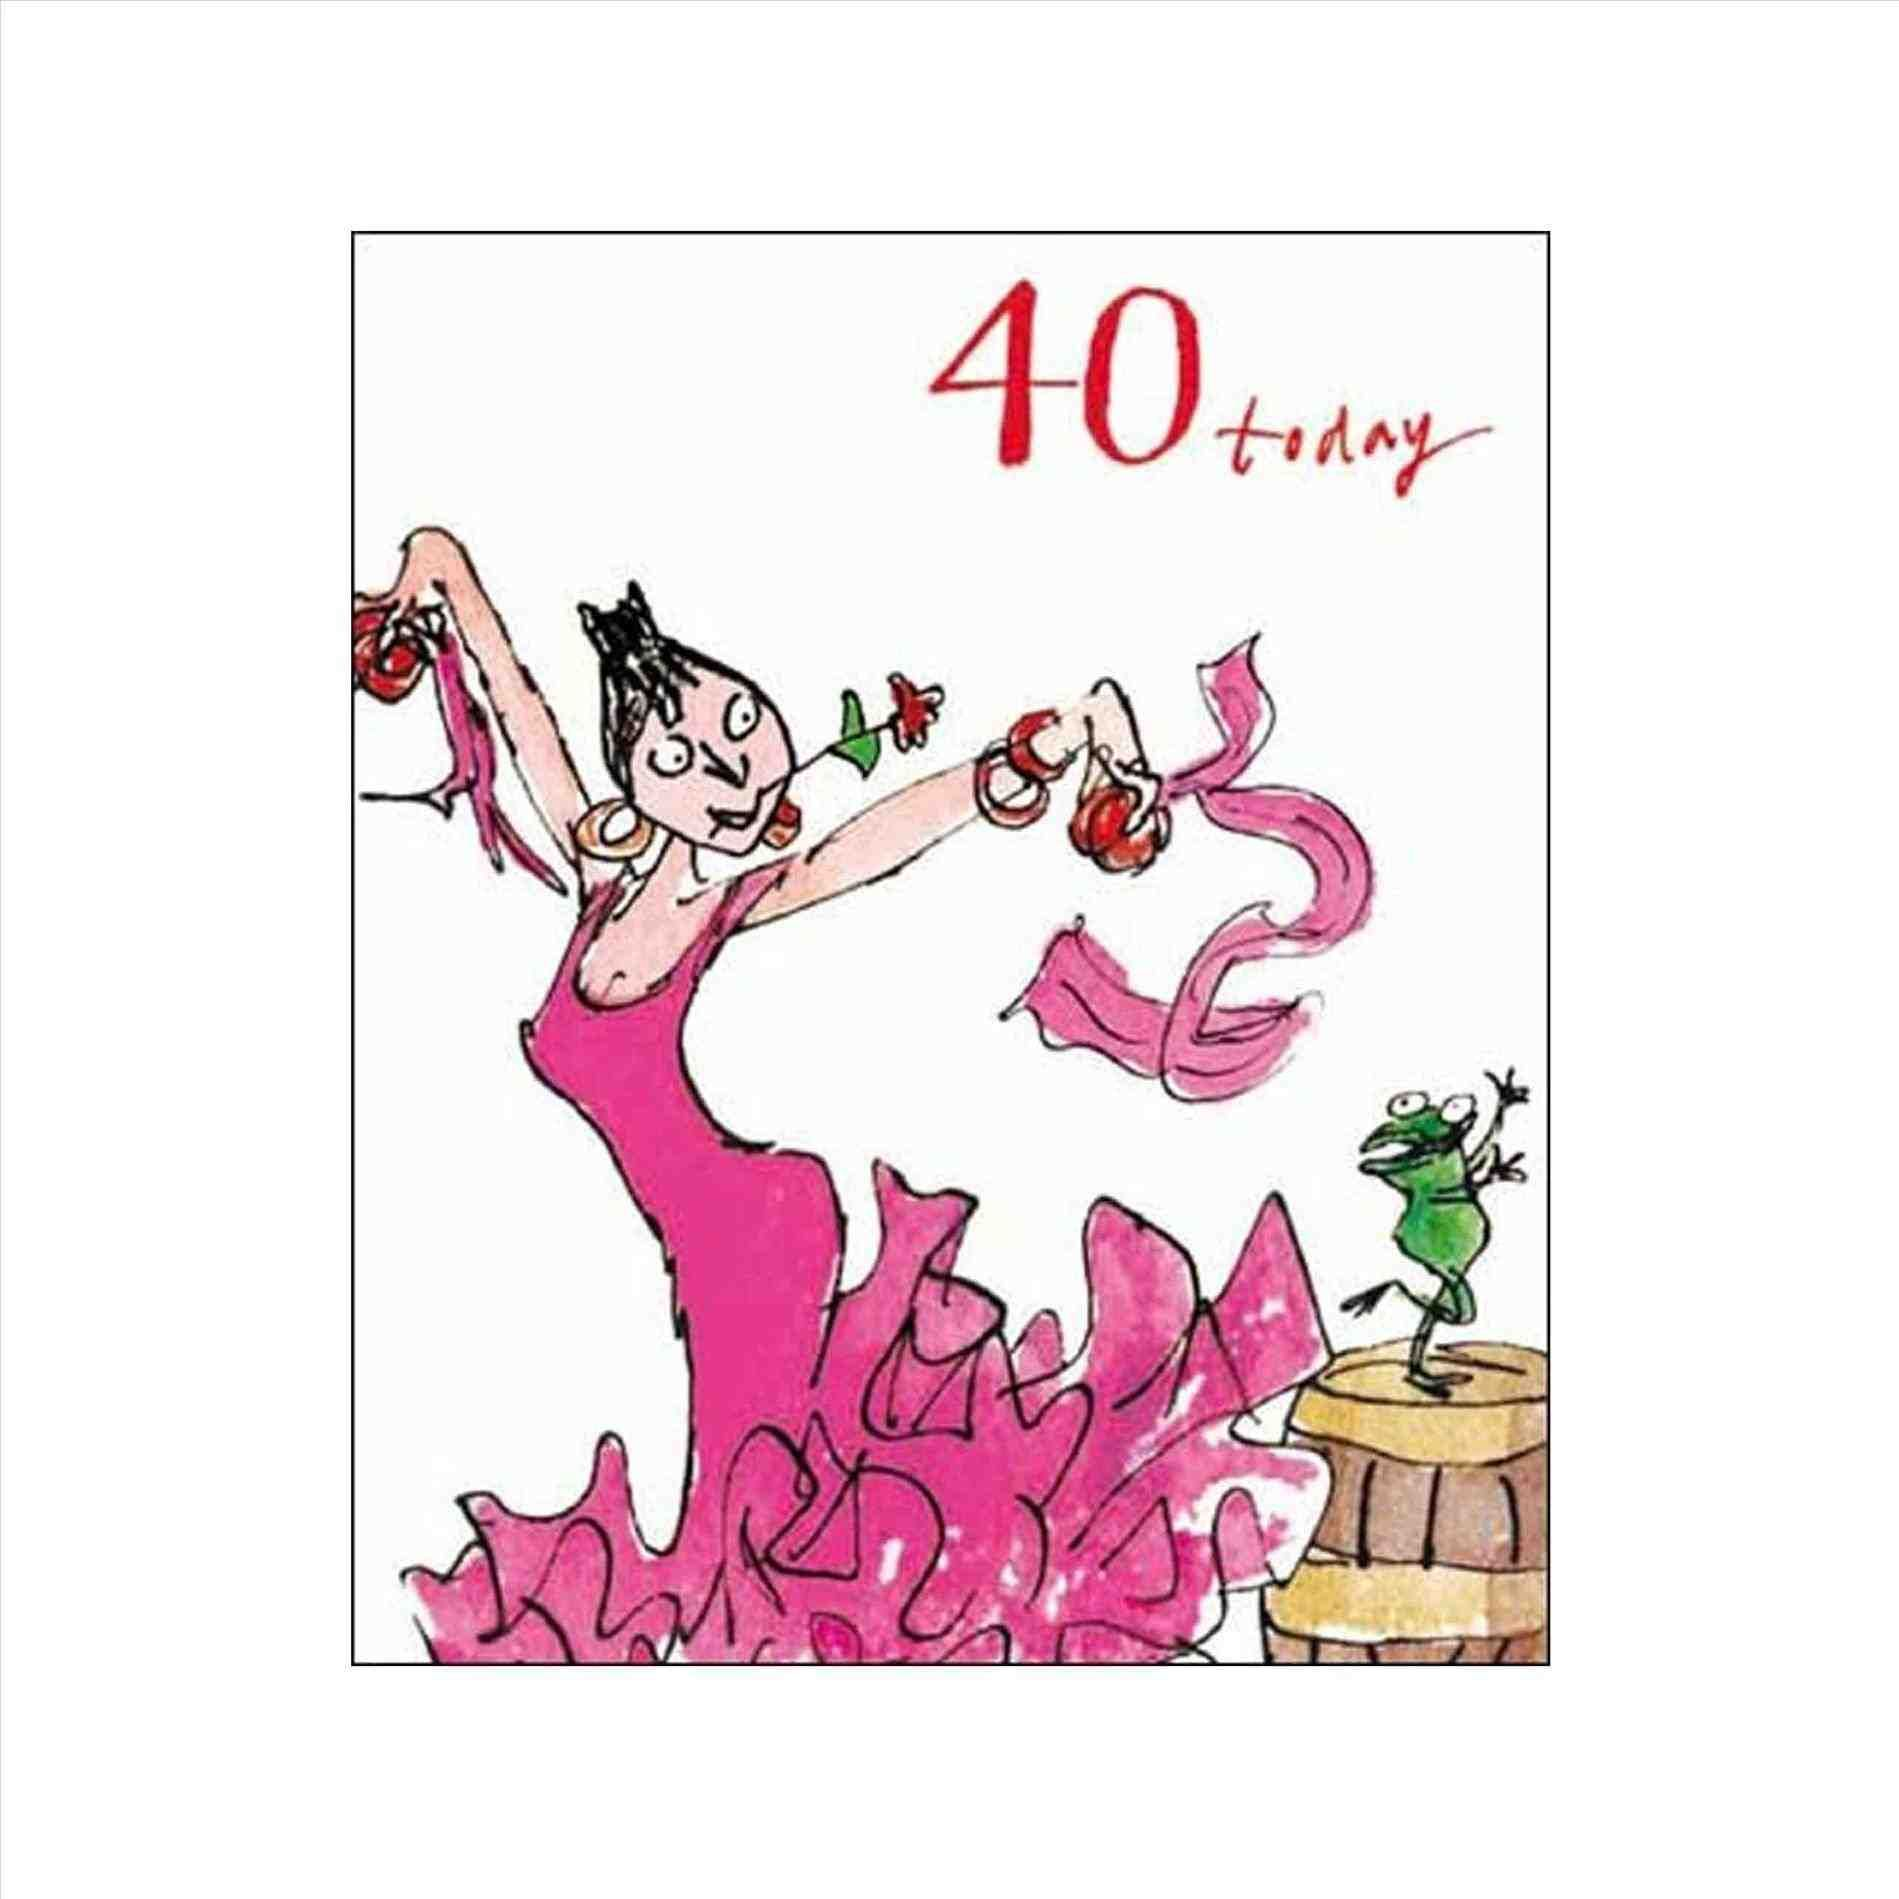 40th Birthday Cards, Funny